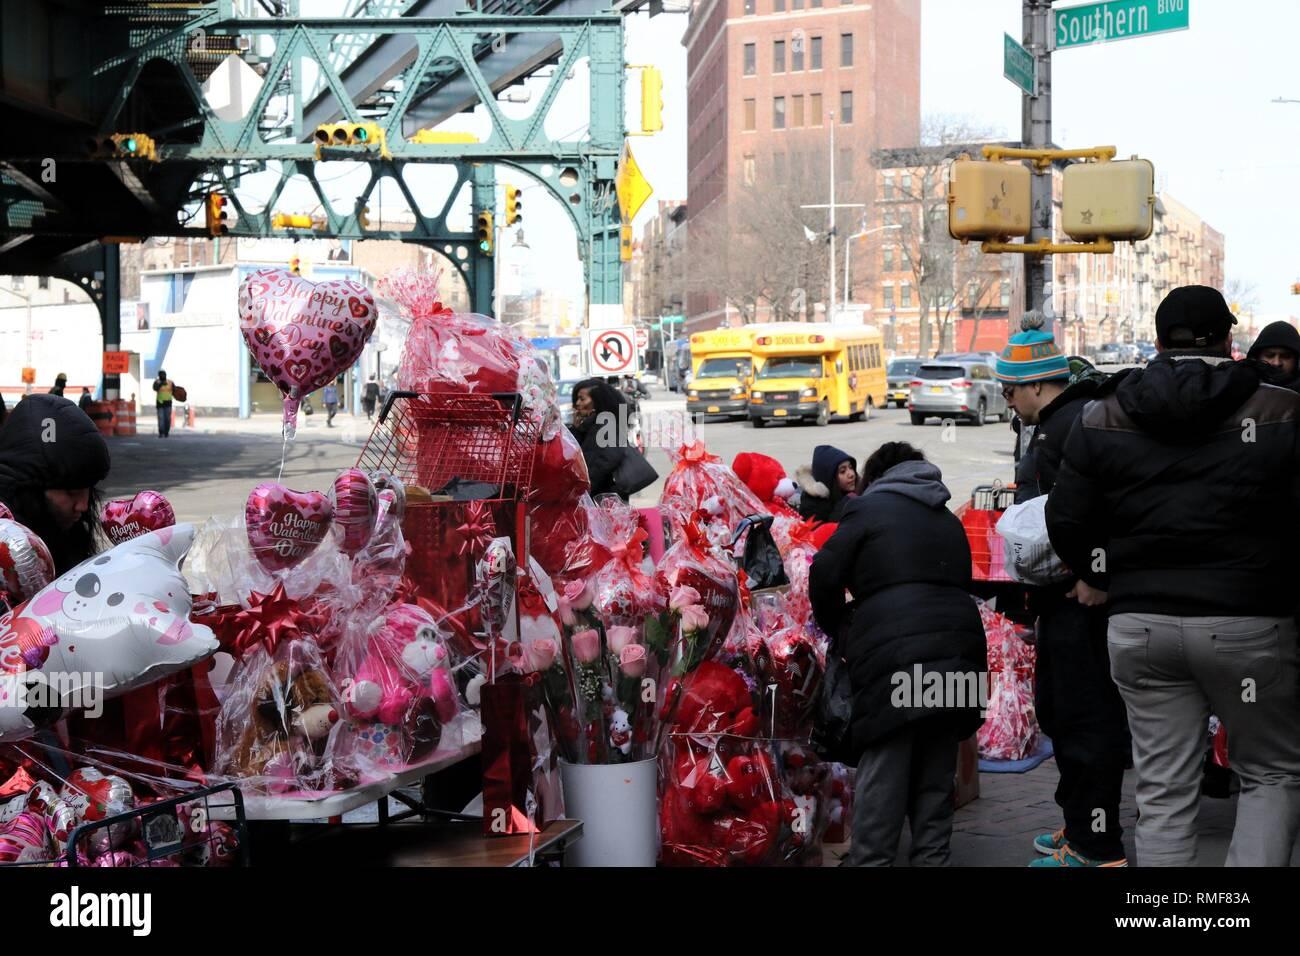 New York City, New York, USA  14th Feb, 2019  Hectic